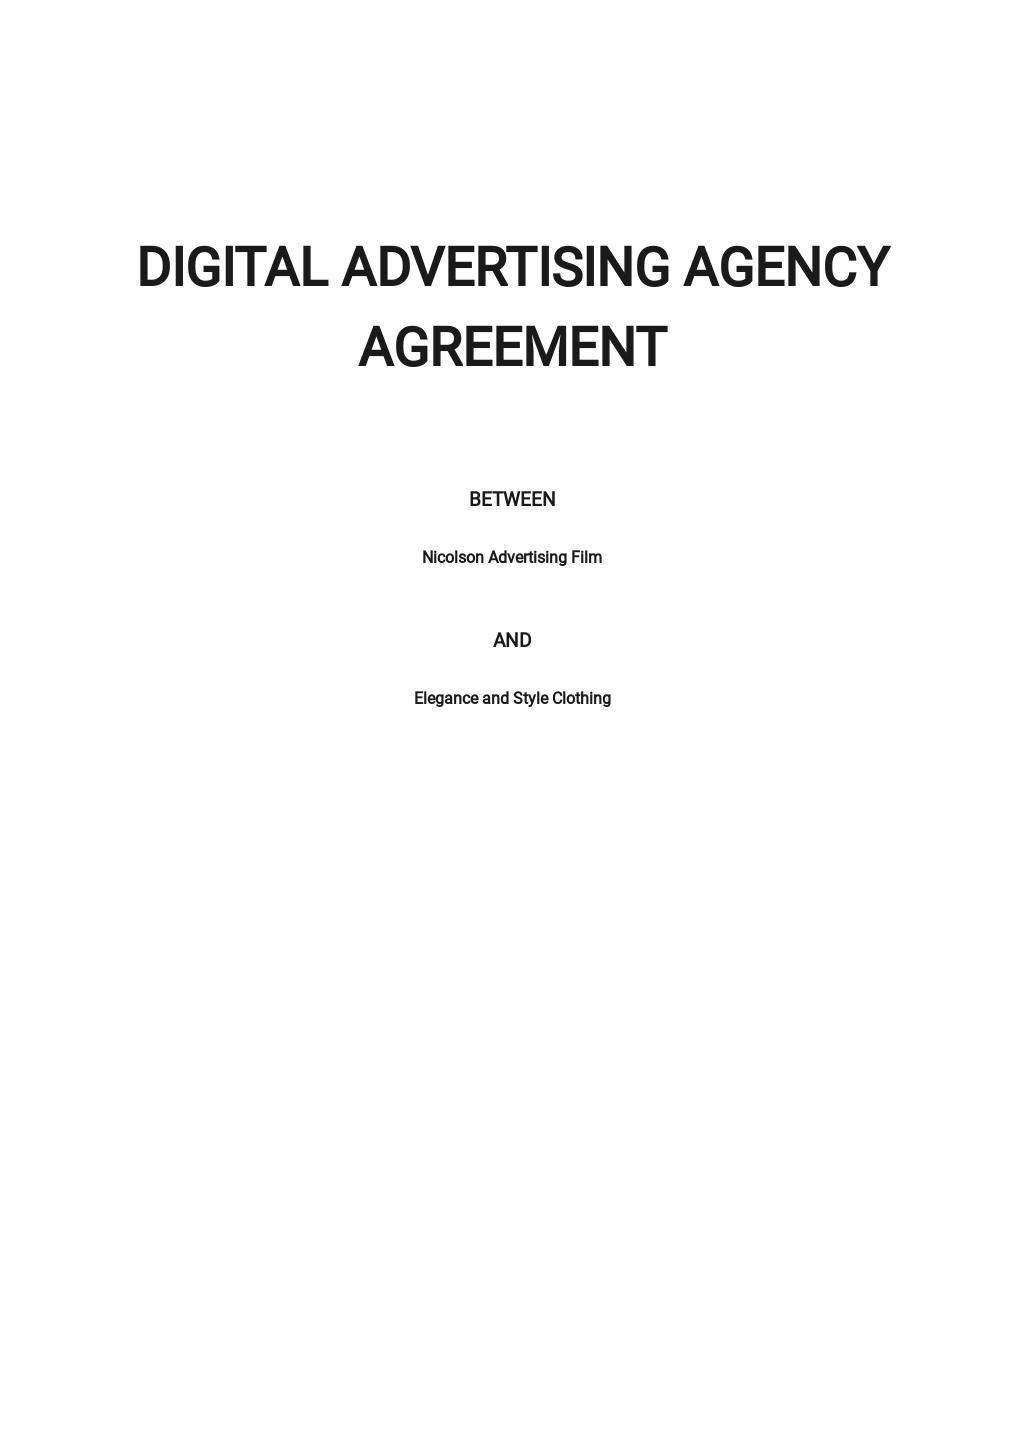 Digital Advertising Agency Agreement Template